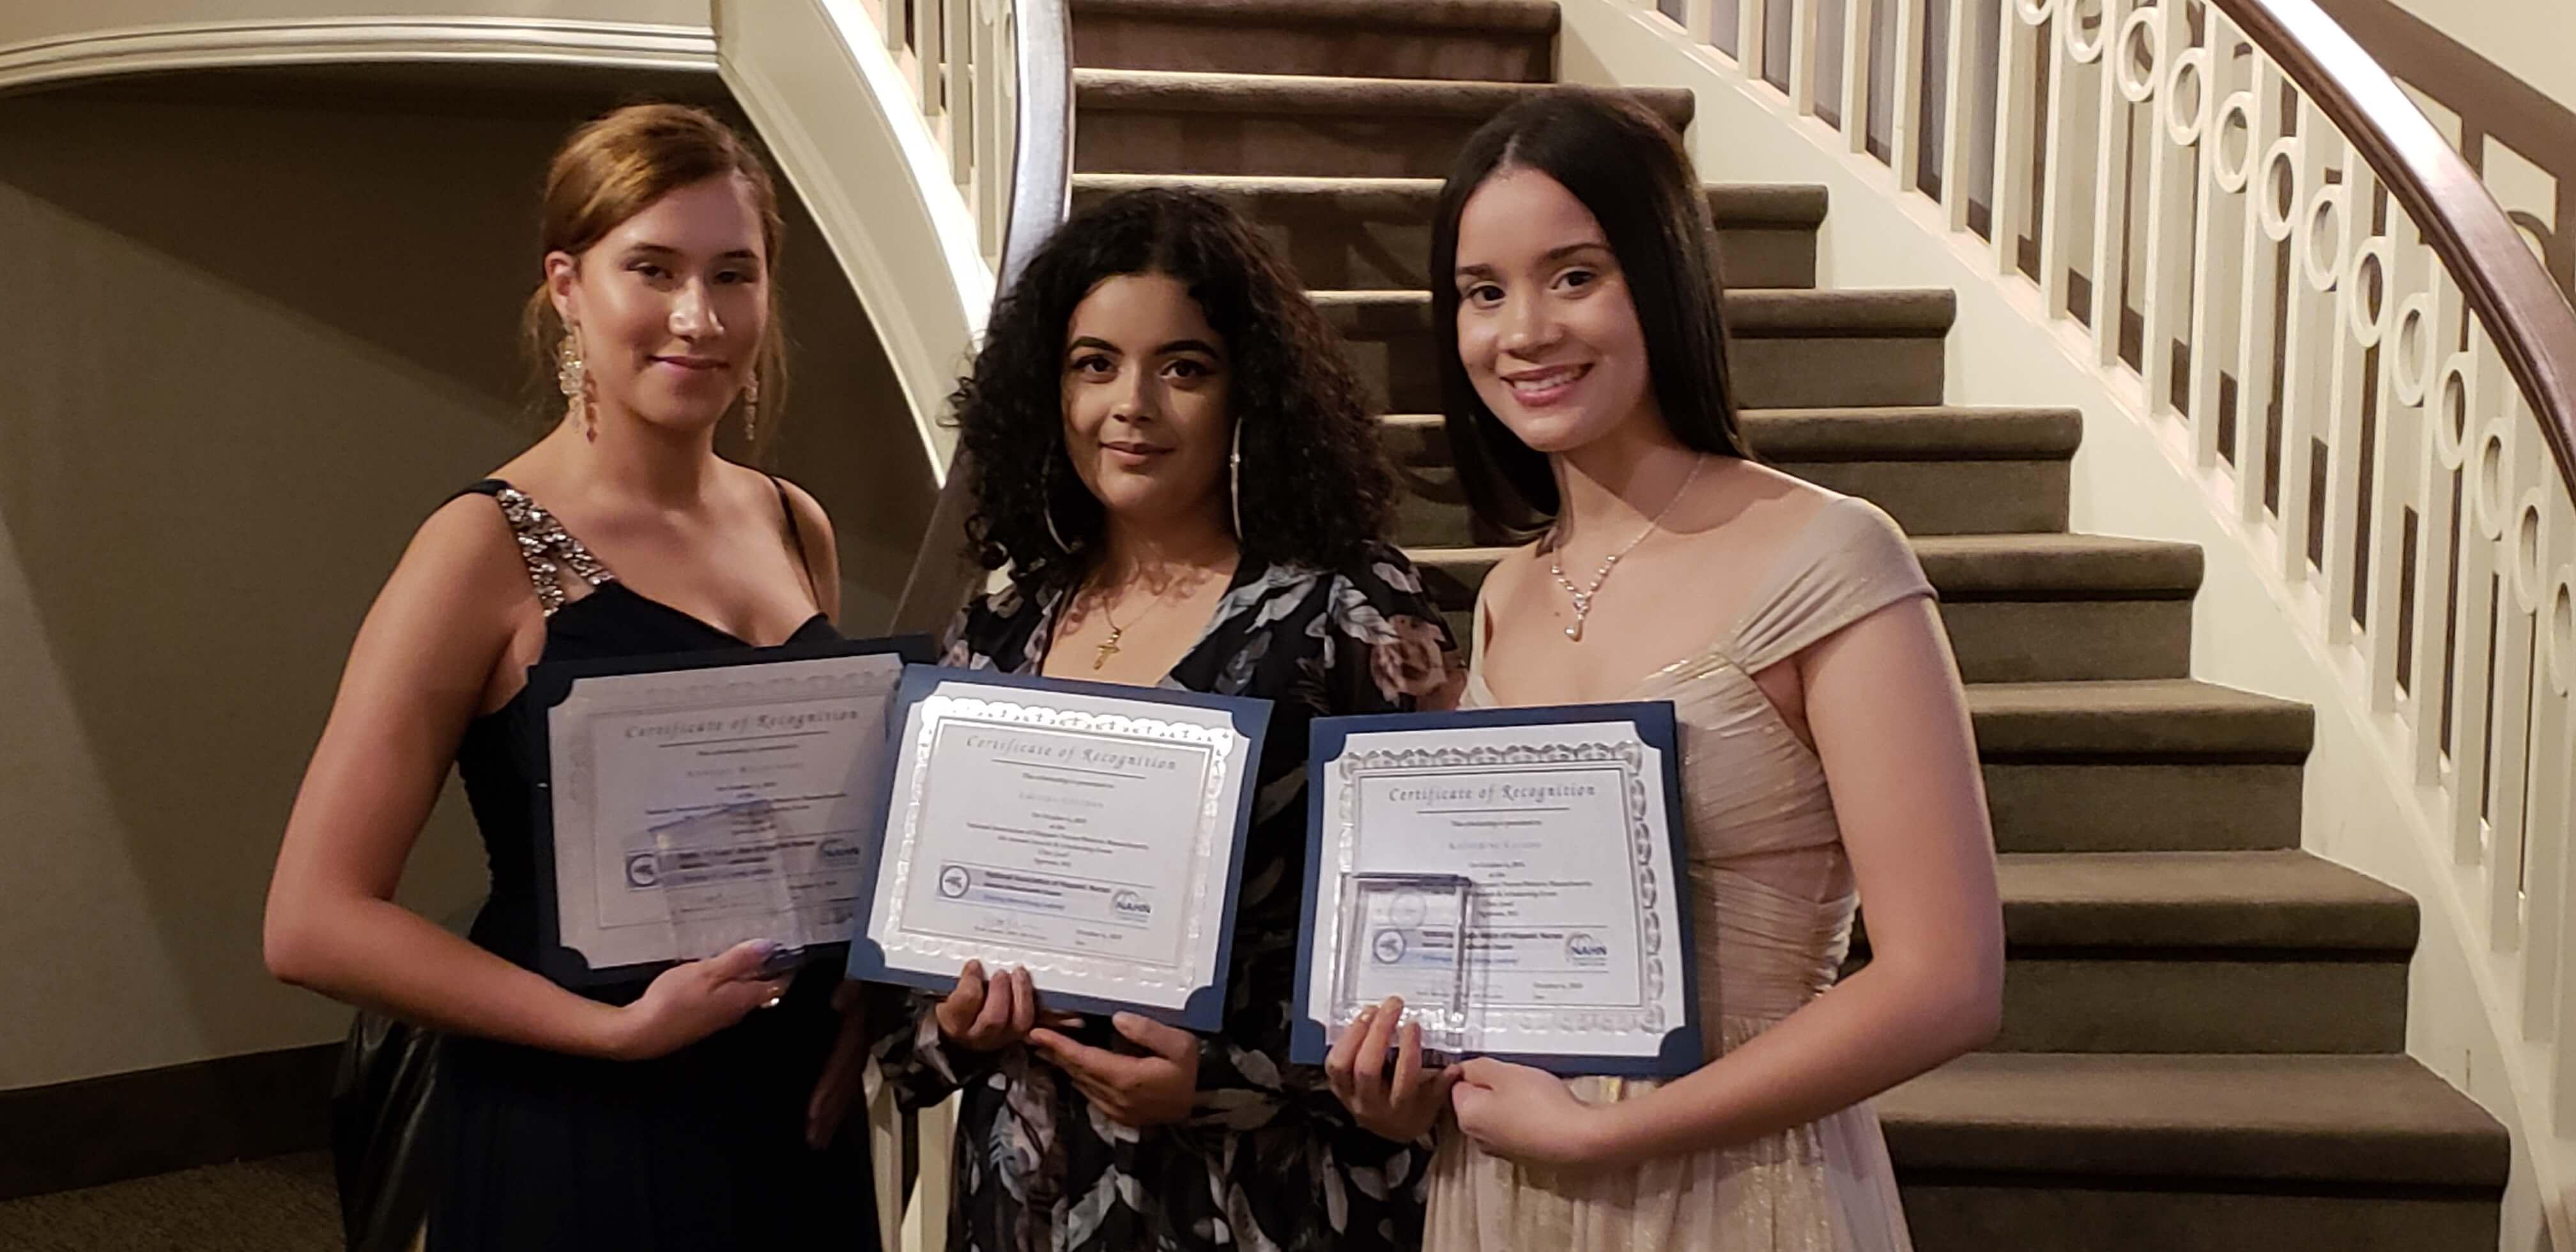 Photo of Nursing majors Annabel Maldonado '19 (left), Luceida Cintron '21 (middle), and Katherine Casado '19 (right)